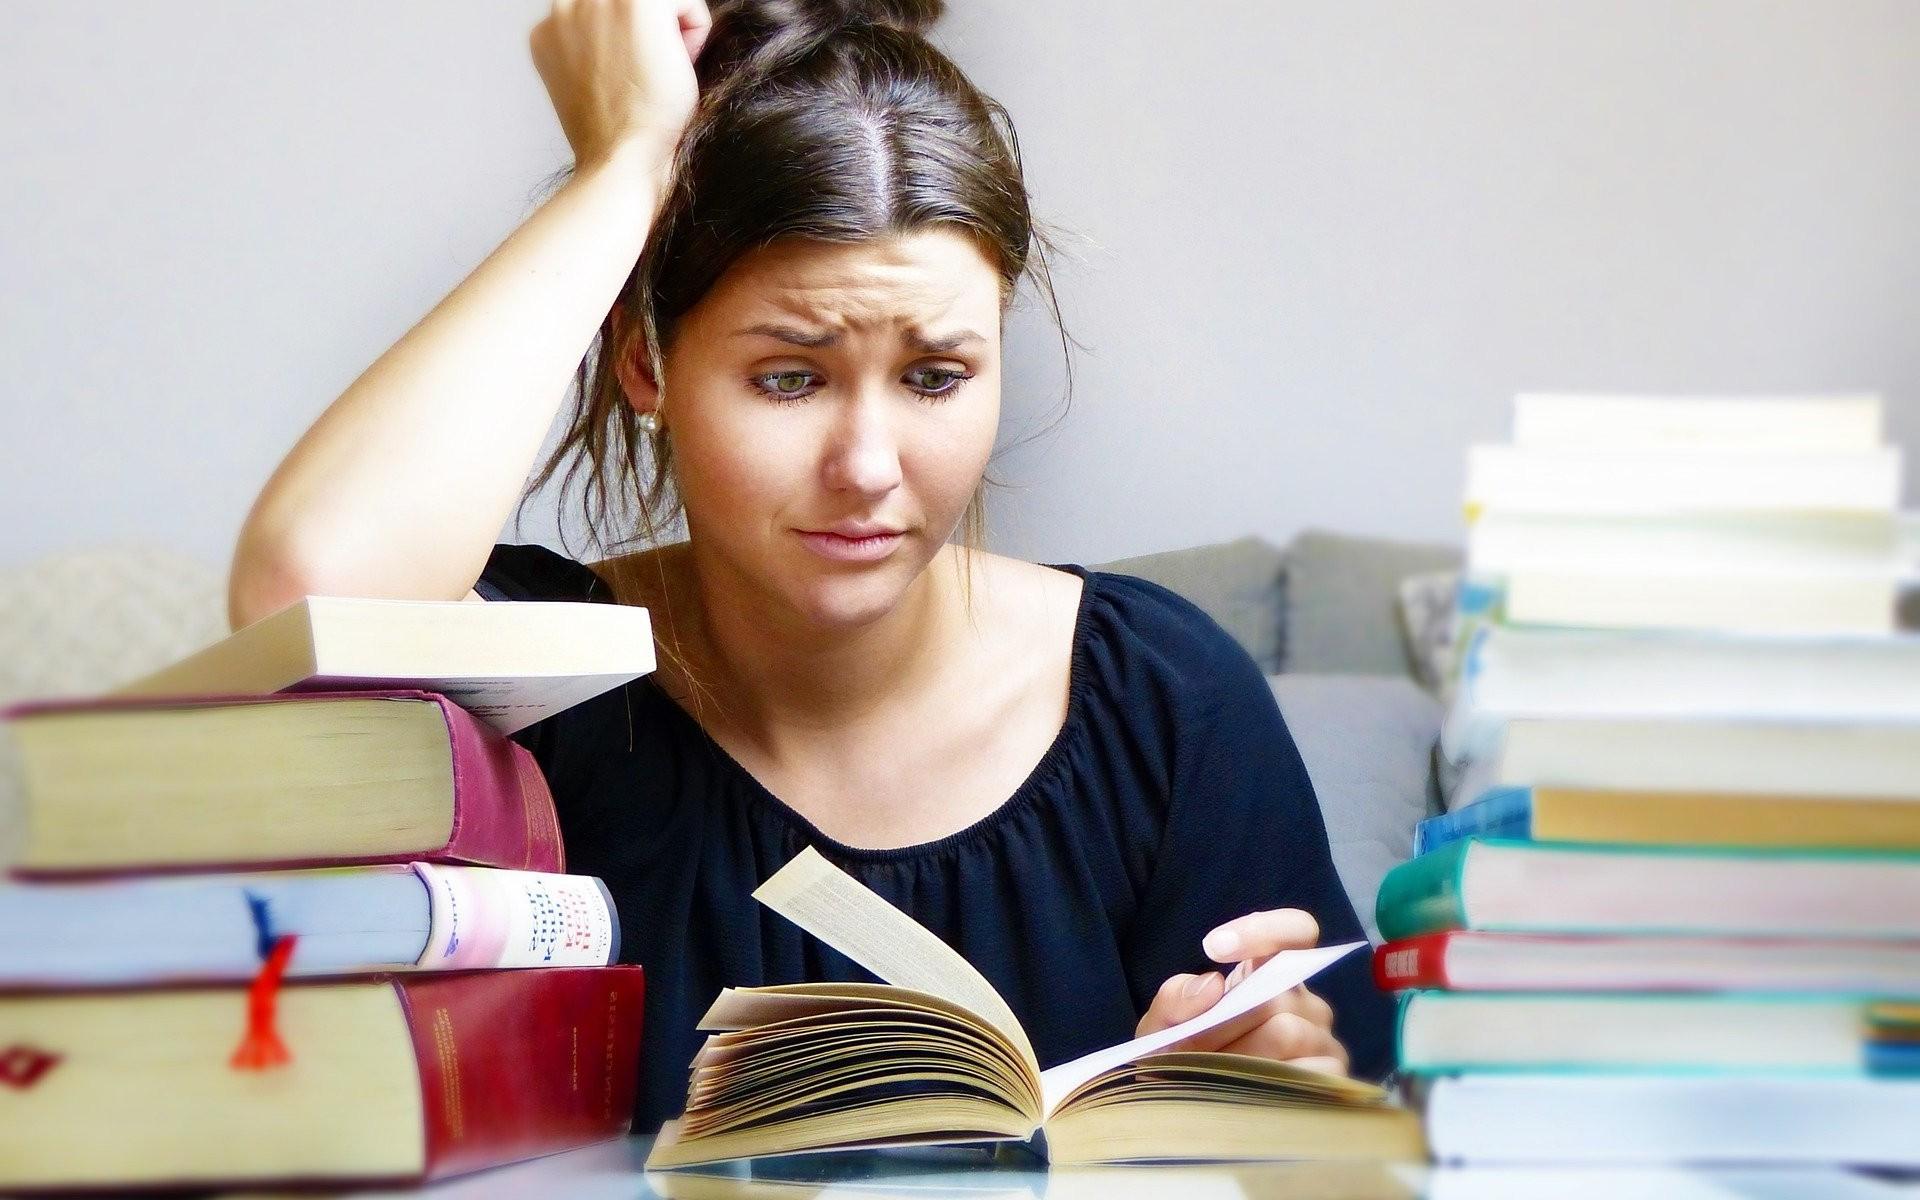 unemployed study stress confussion - The Data Tribune